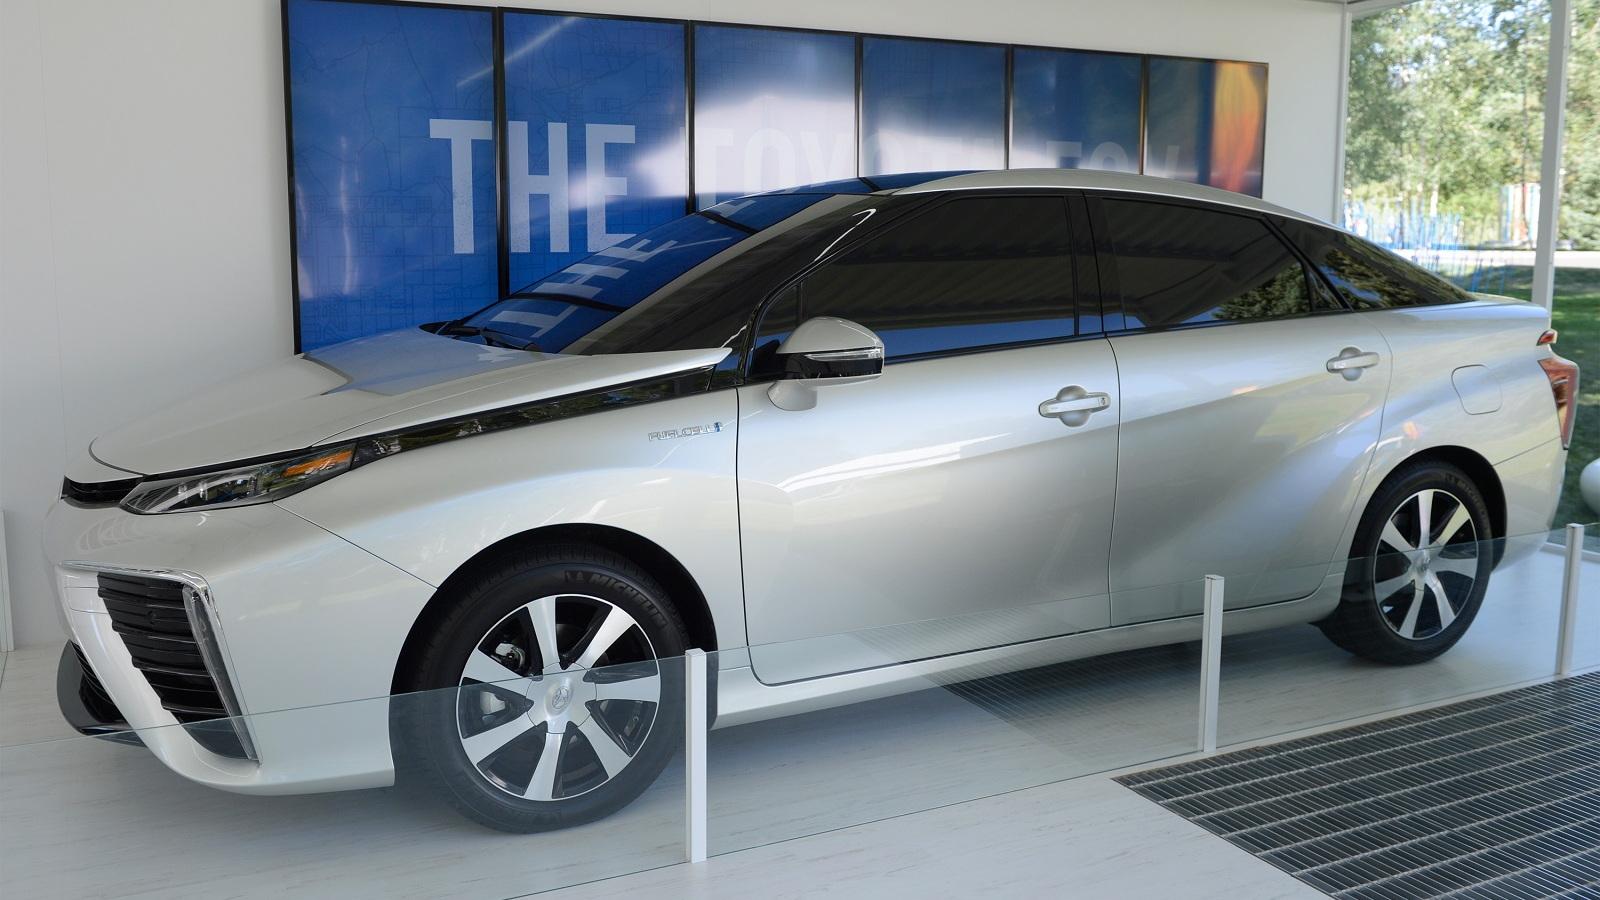 Toyota Fuel Cell Sedan at Aspen Ideas Festival  [photo: Riccardo Savi]